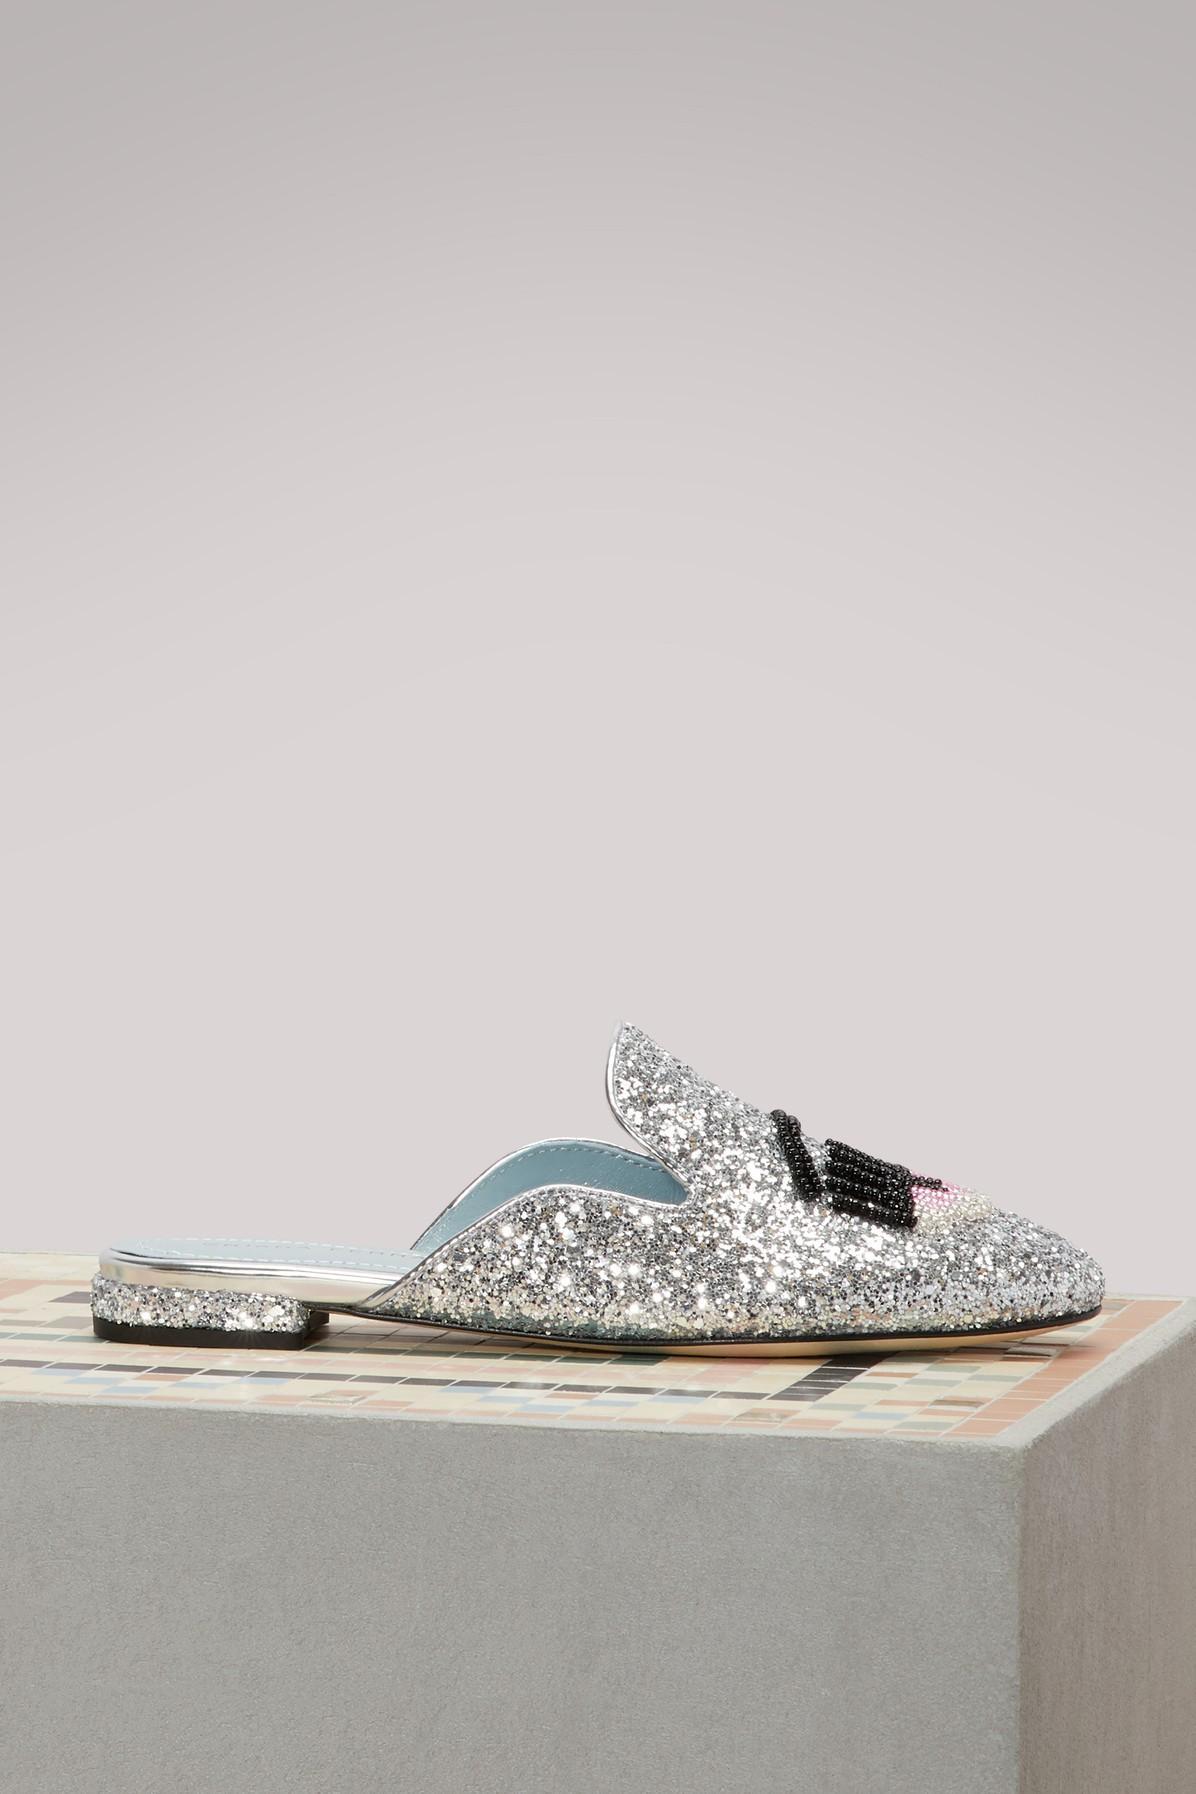 Chiara Ferragni Suite Life Flat In Silver Glitter